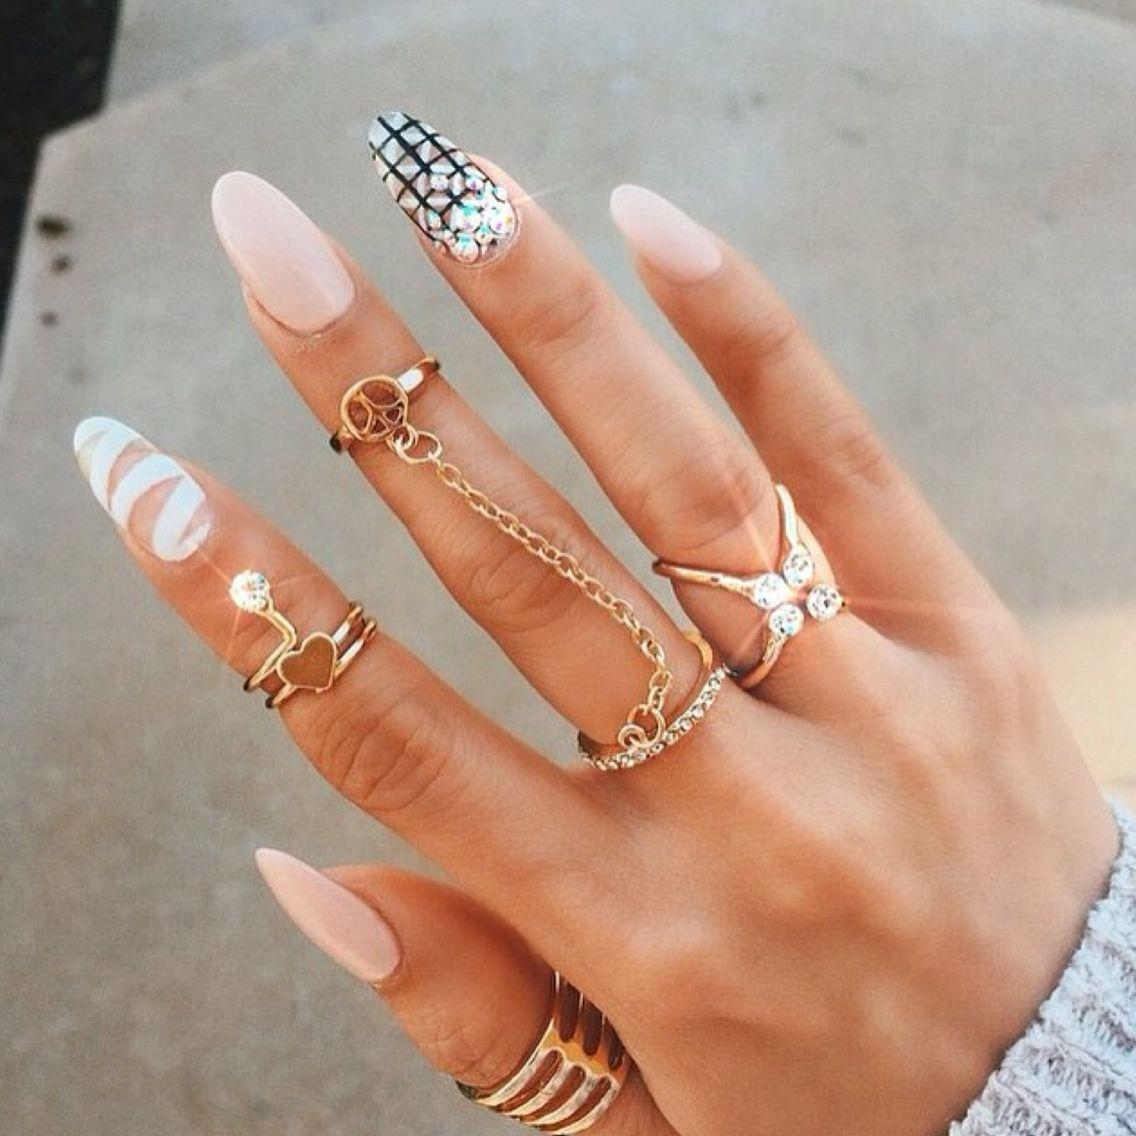 Pinterest: taybeesy ➰   Nails   Pinterest   Manicure, Nail nail and ...